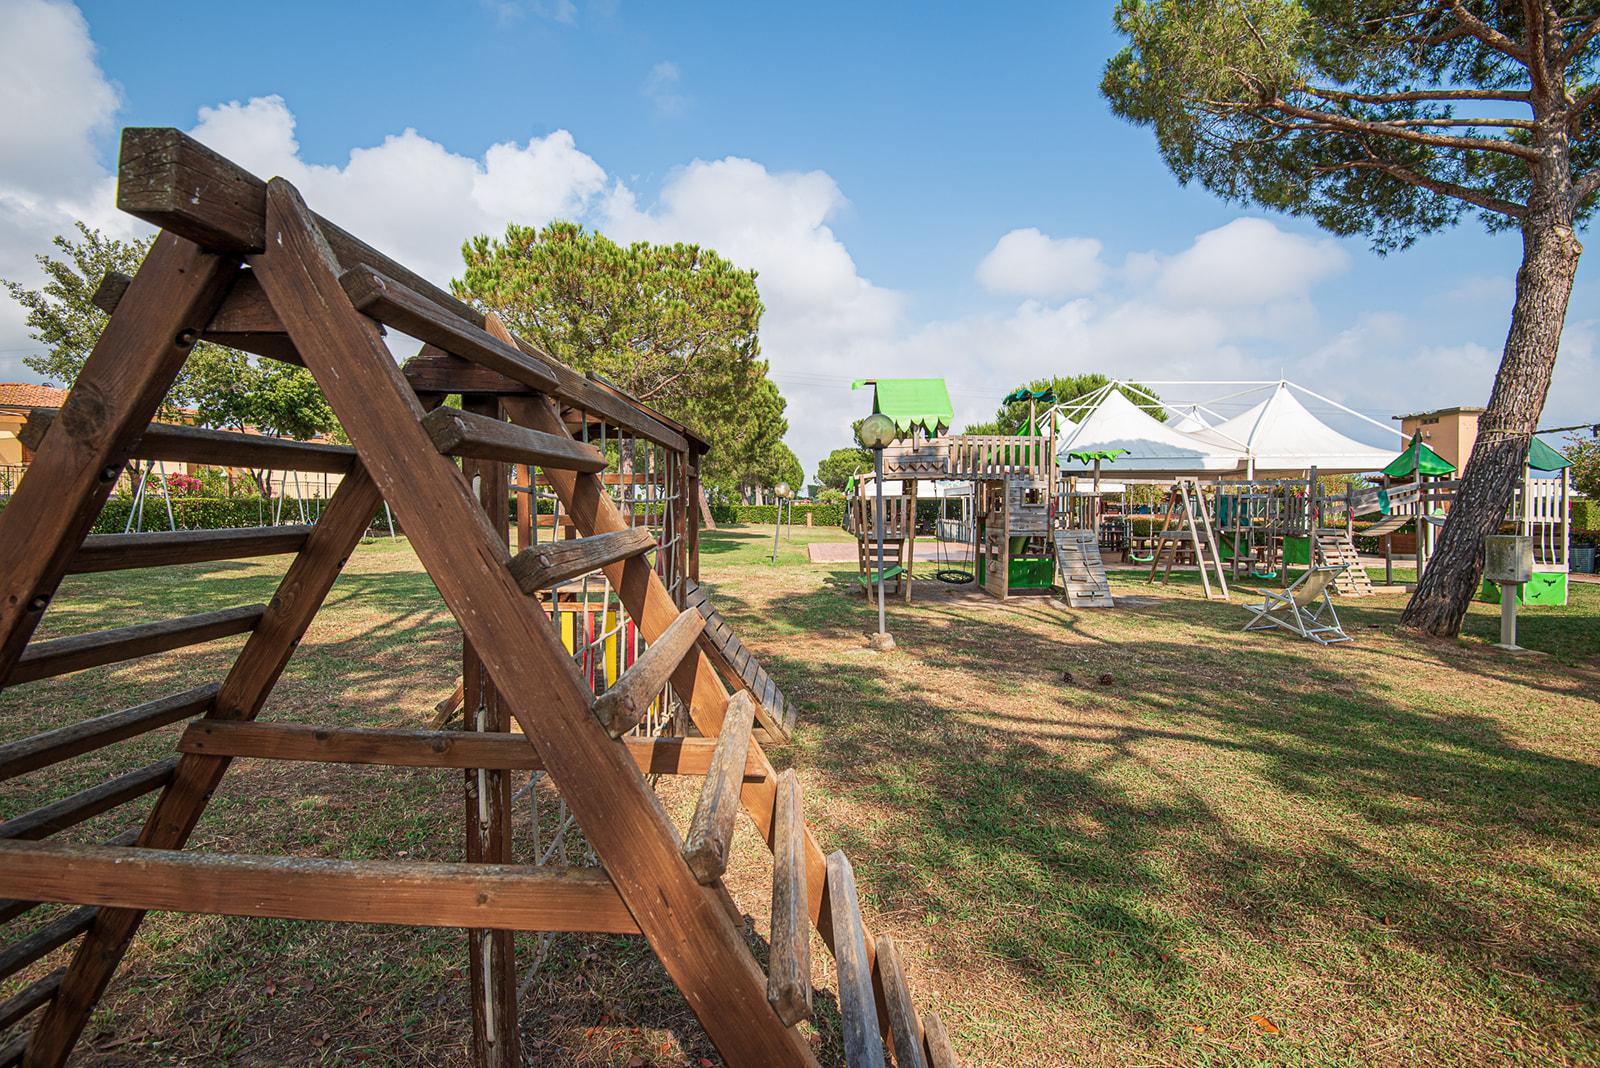 Offerte Maggio in Maremma Toscana - Resort Capalbio